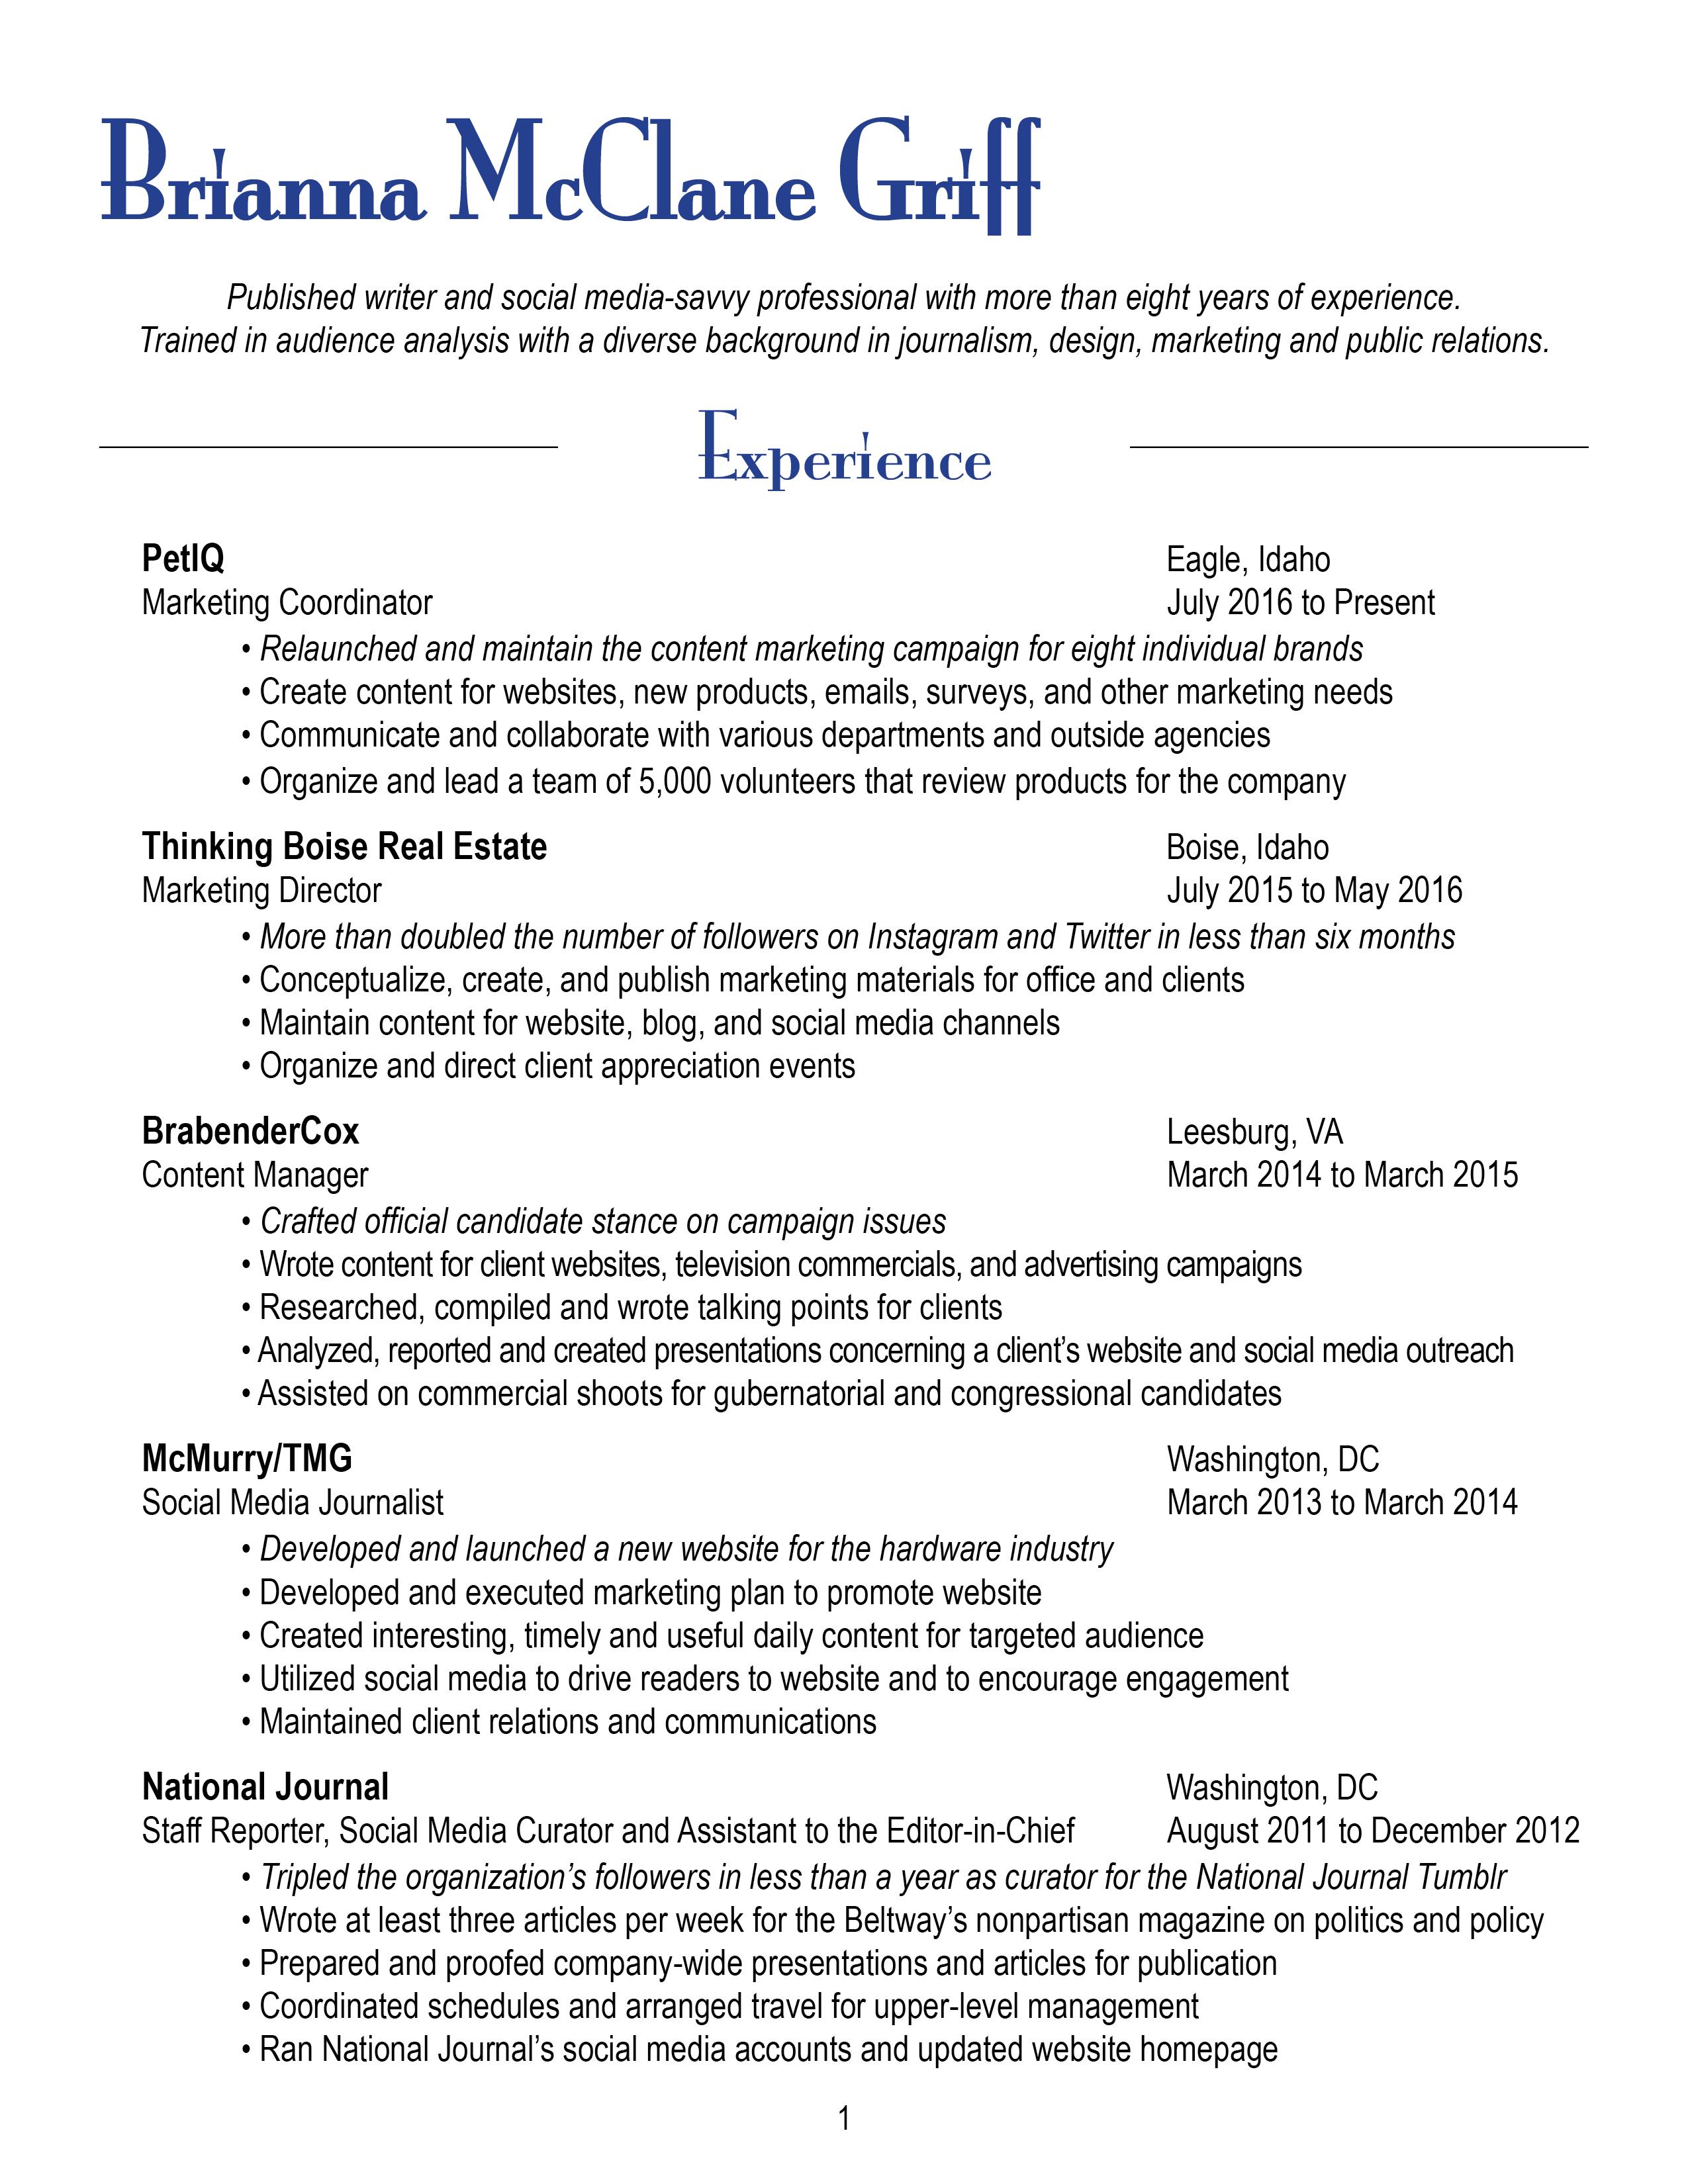 Resume – Brianna McClane Griff